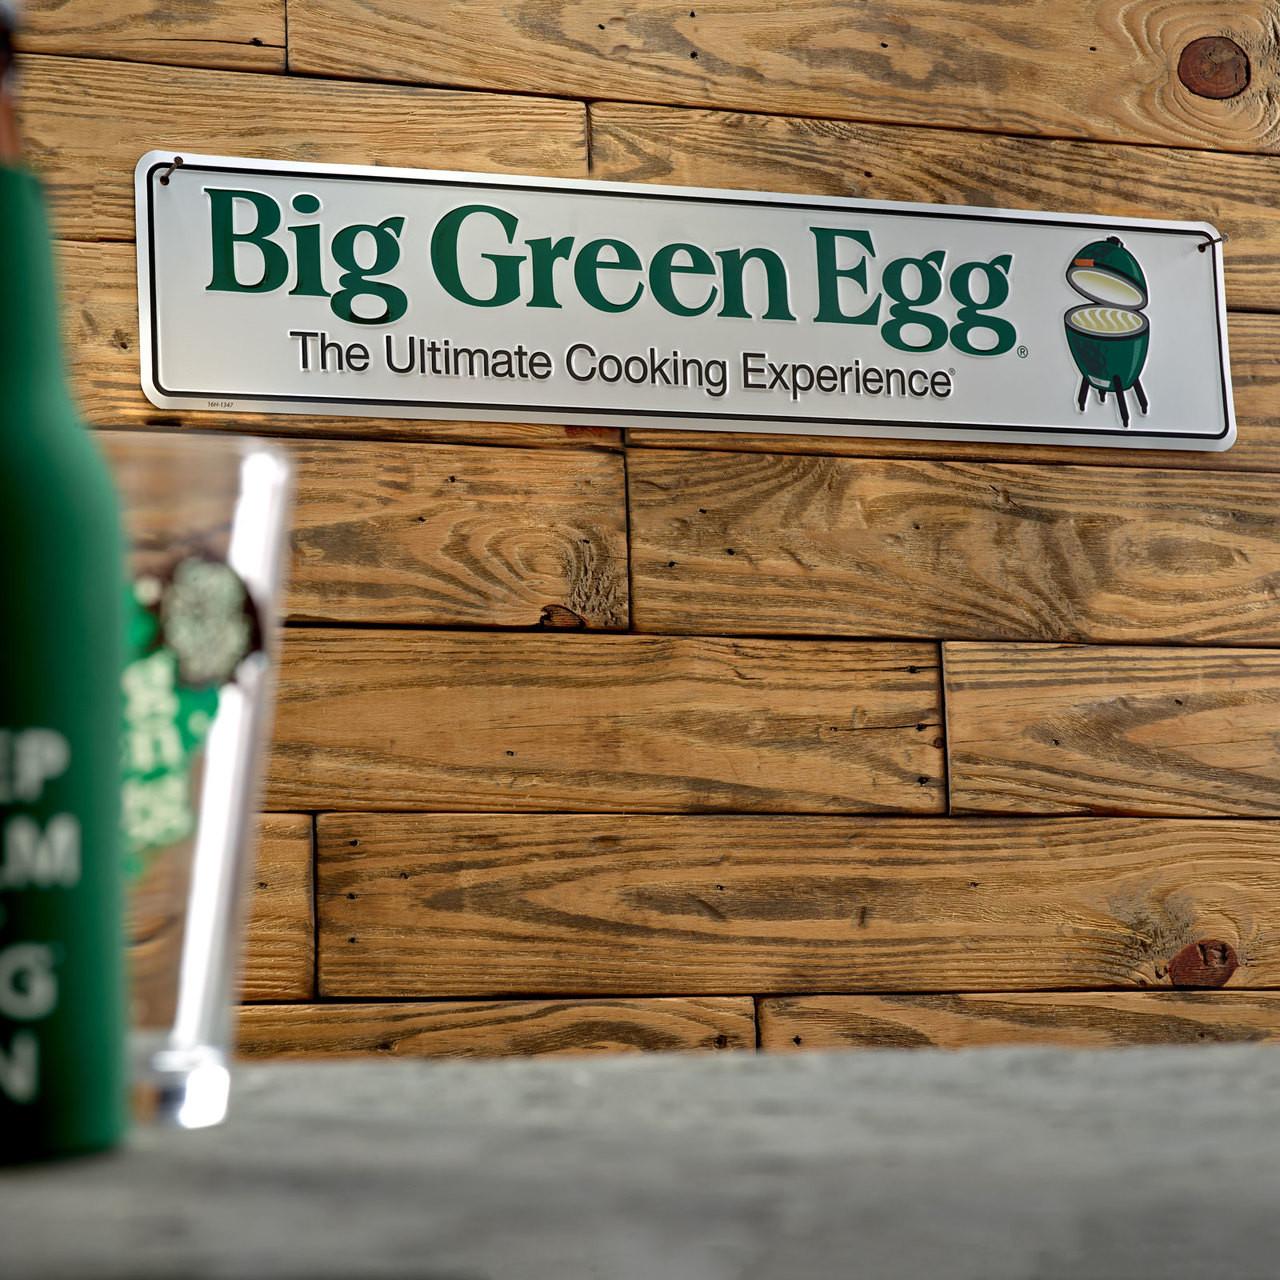 Big Green Egg Street Sign